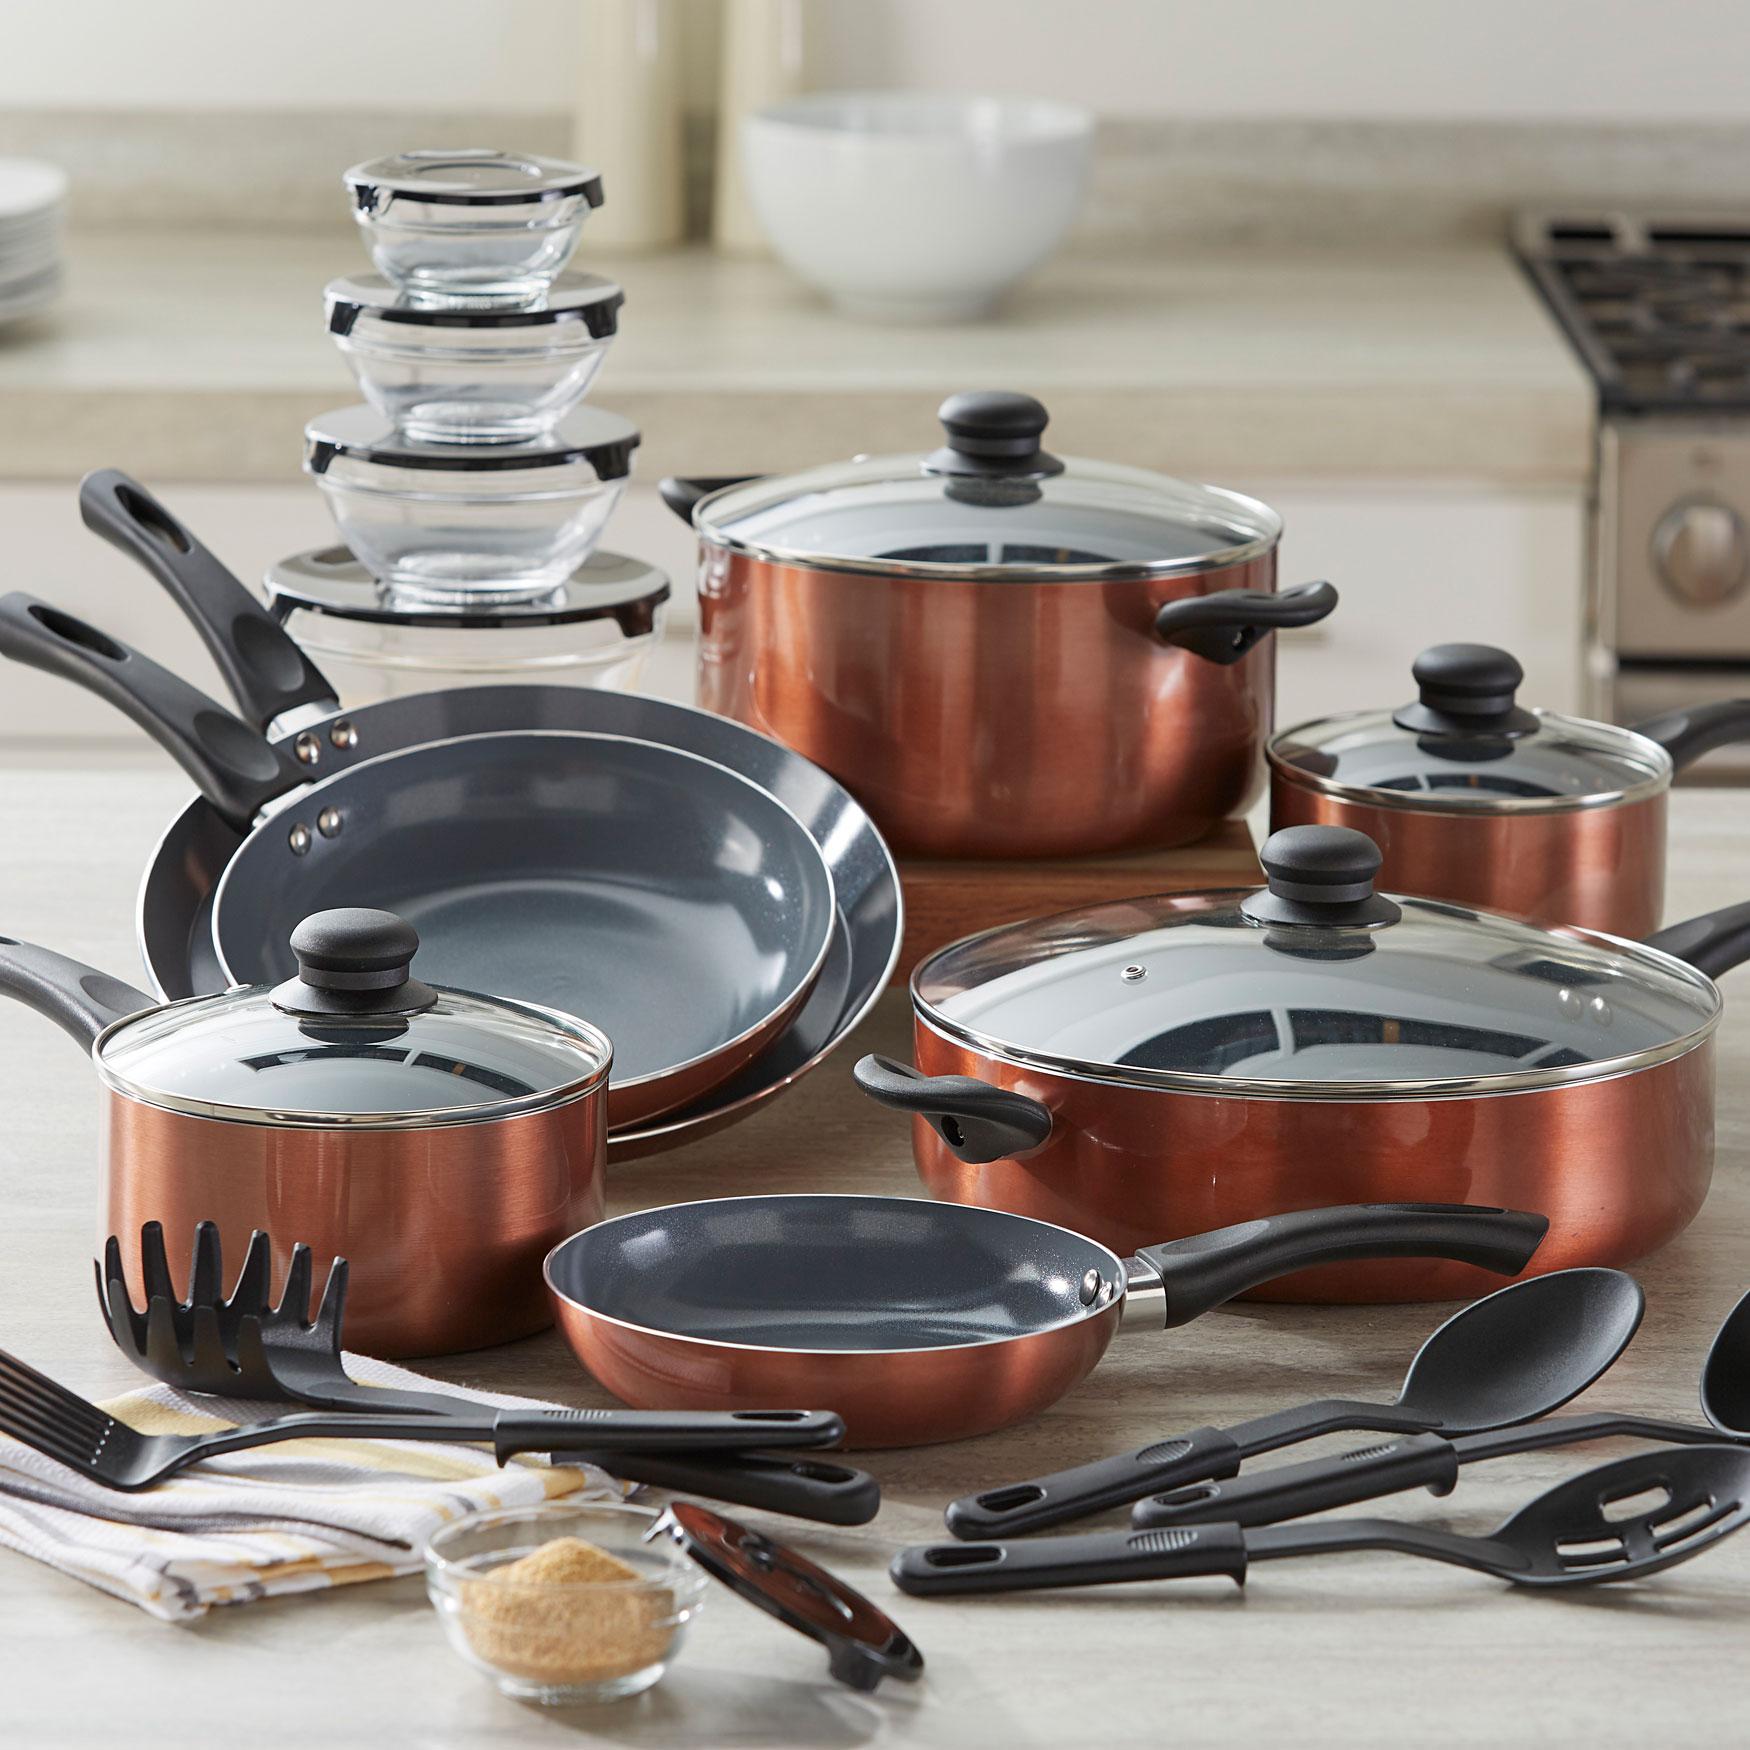 Brylane Home Kitchen: 26-Pc. Aluminum Cookware Set